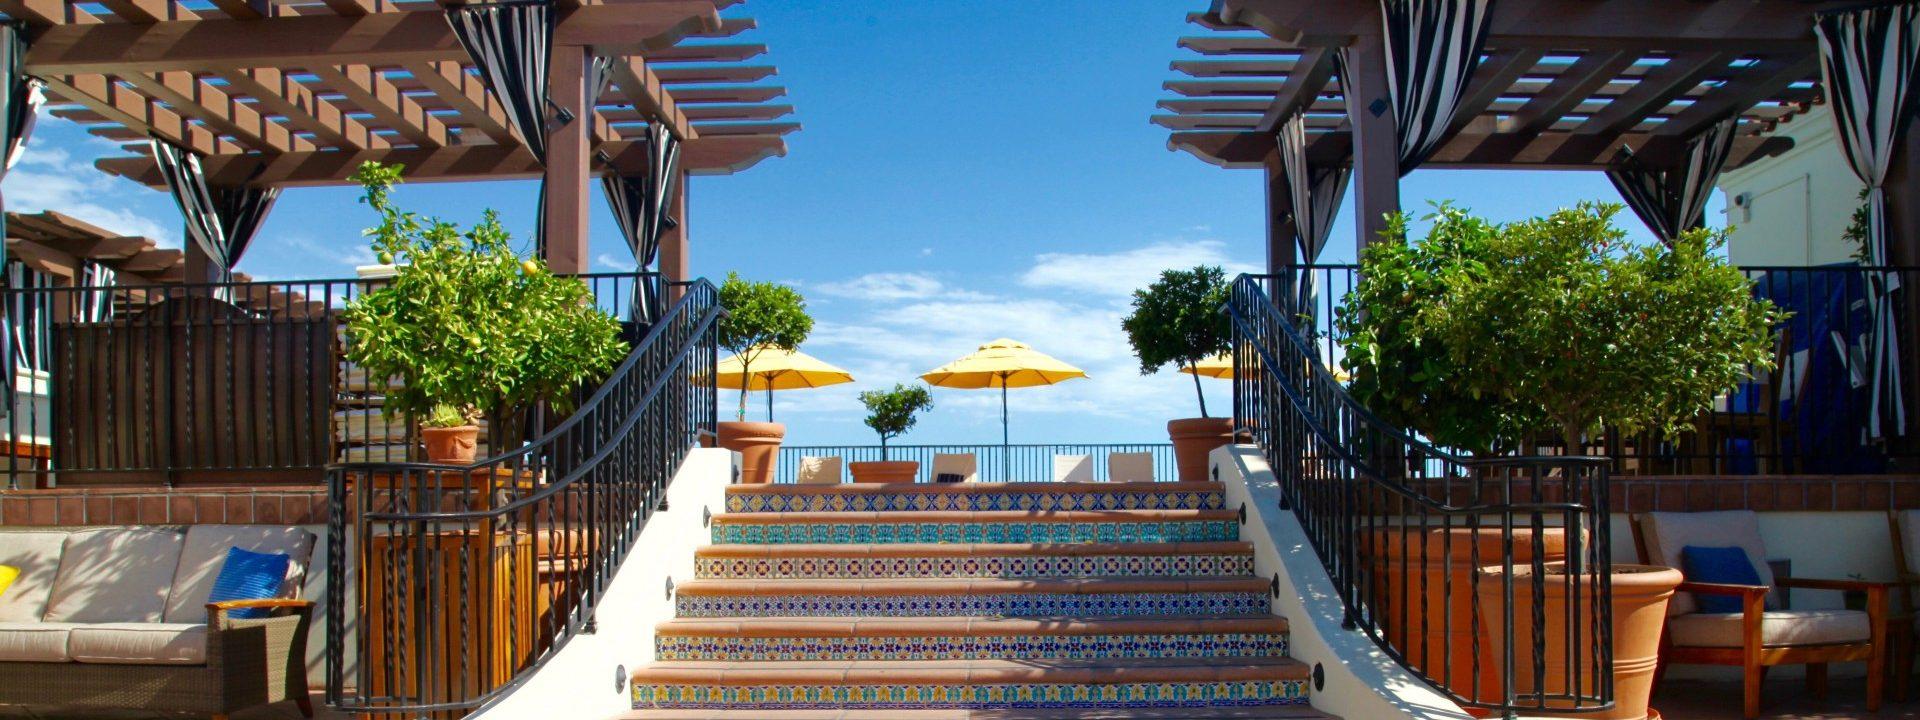 Perk up! Sip your morning lobby coffee like a star at these Santa Barbara hotels